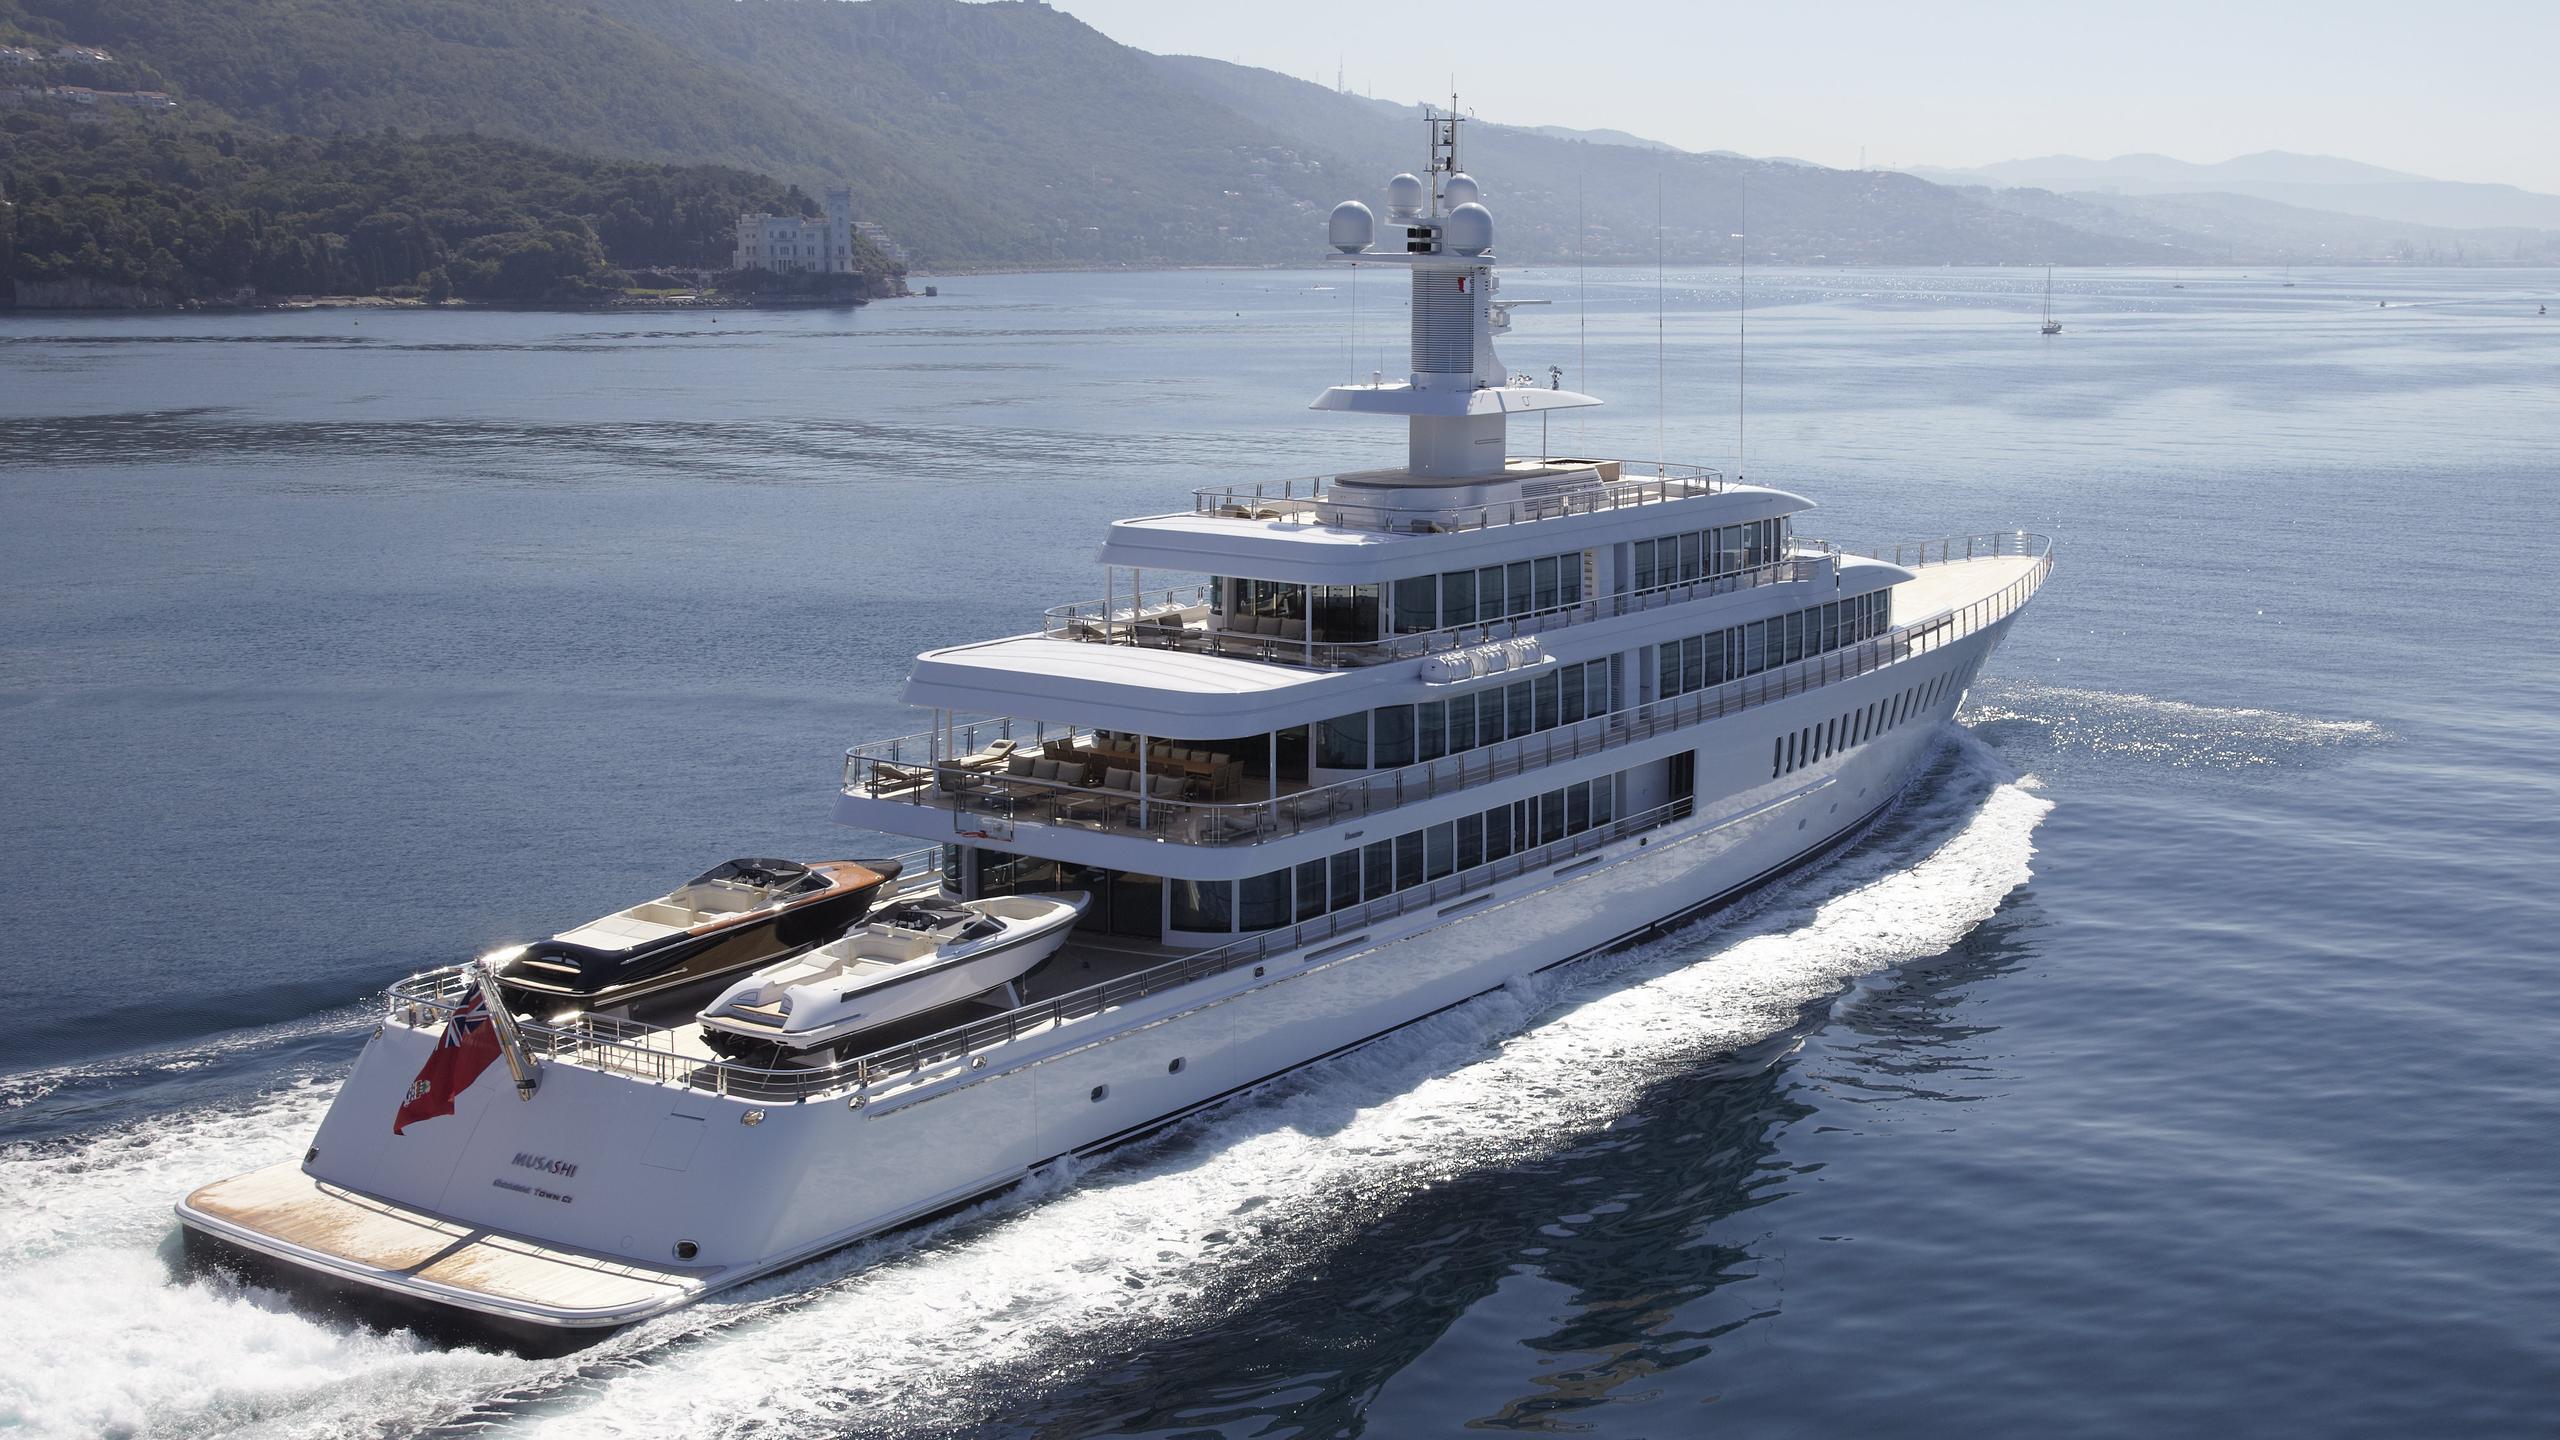 musashi-motor-yacht-feadhsip-2011-88m-stern-cruising